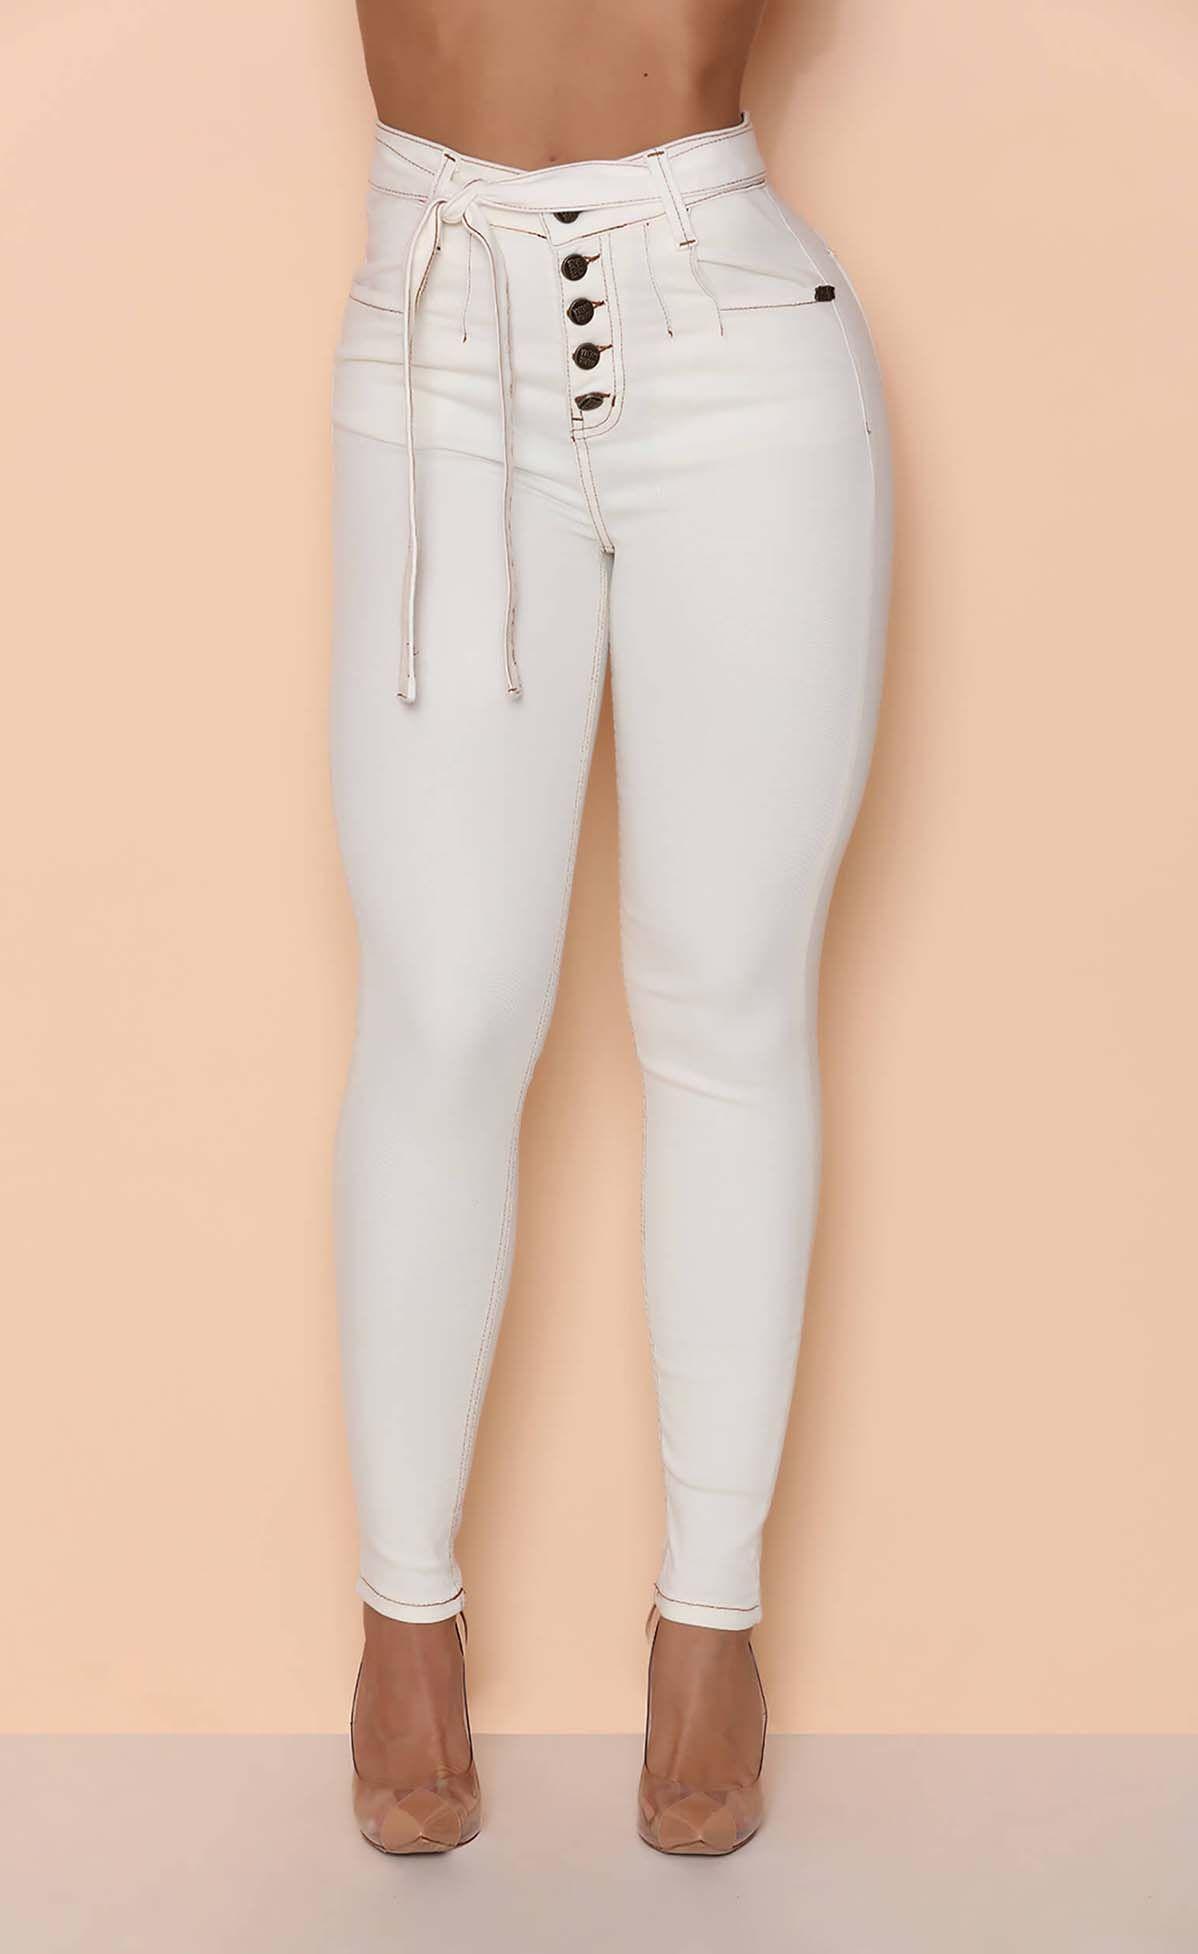 Calça Jeans Botoes All White Maria Gueixa Off White